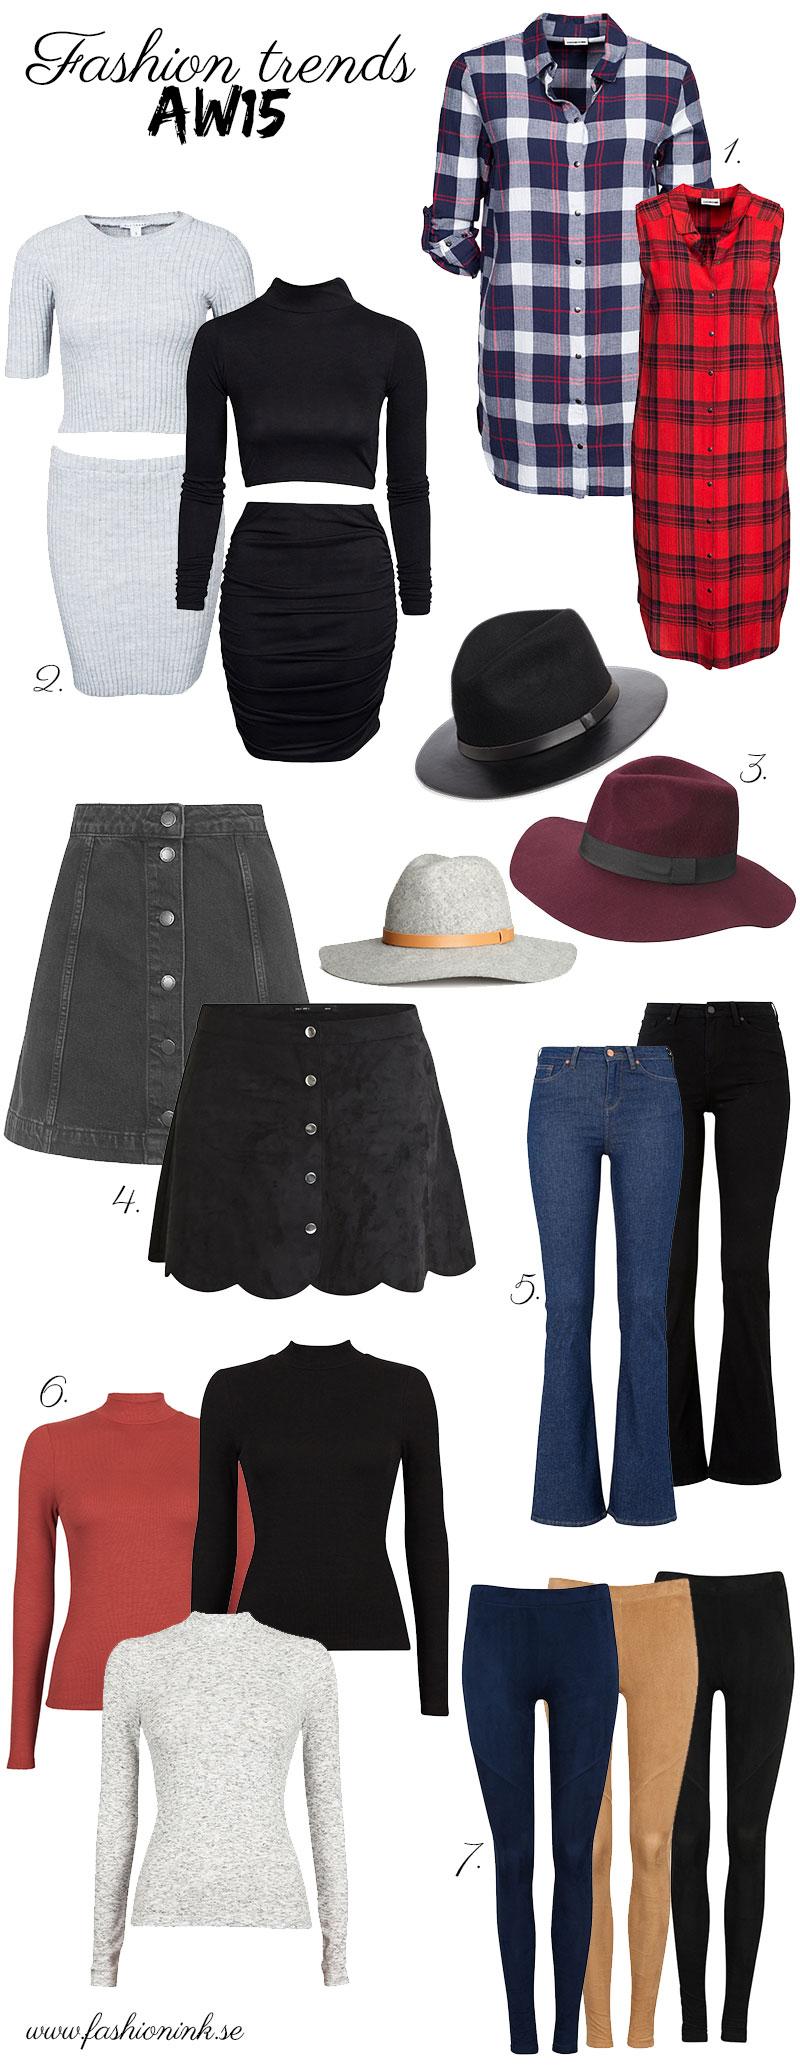 fashiontrendsaw15